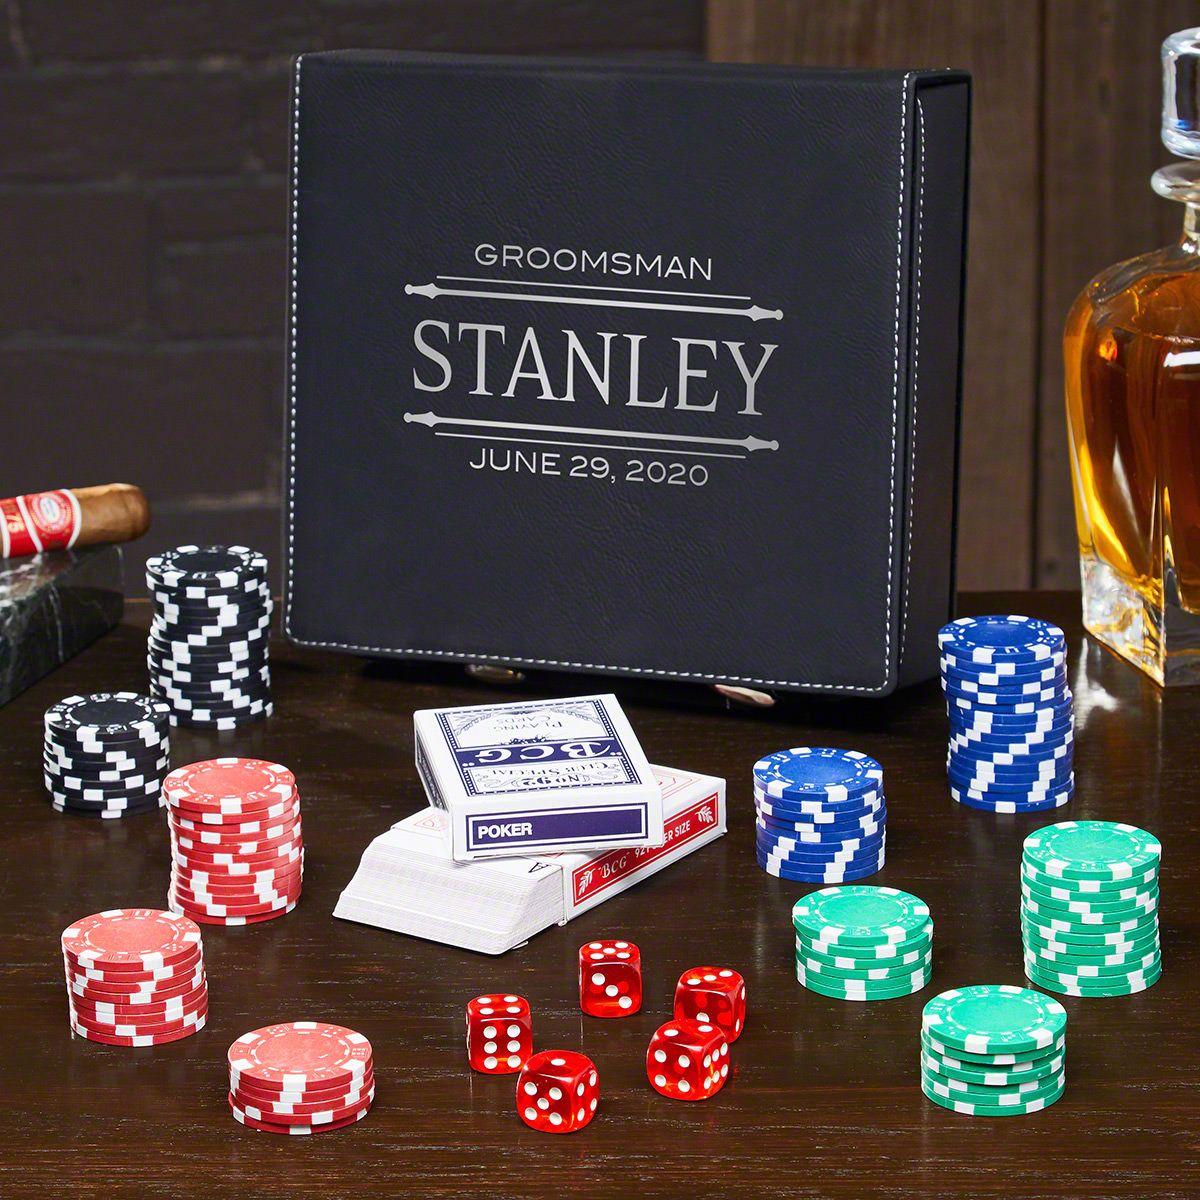 Stanford Personalized Poker Set - Gift for Groomsmen